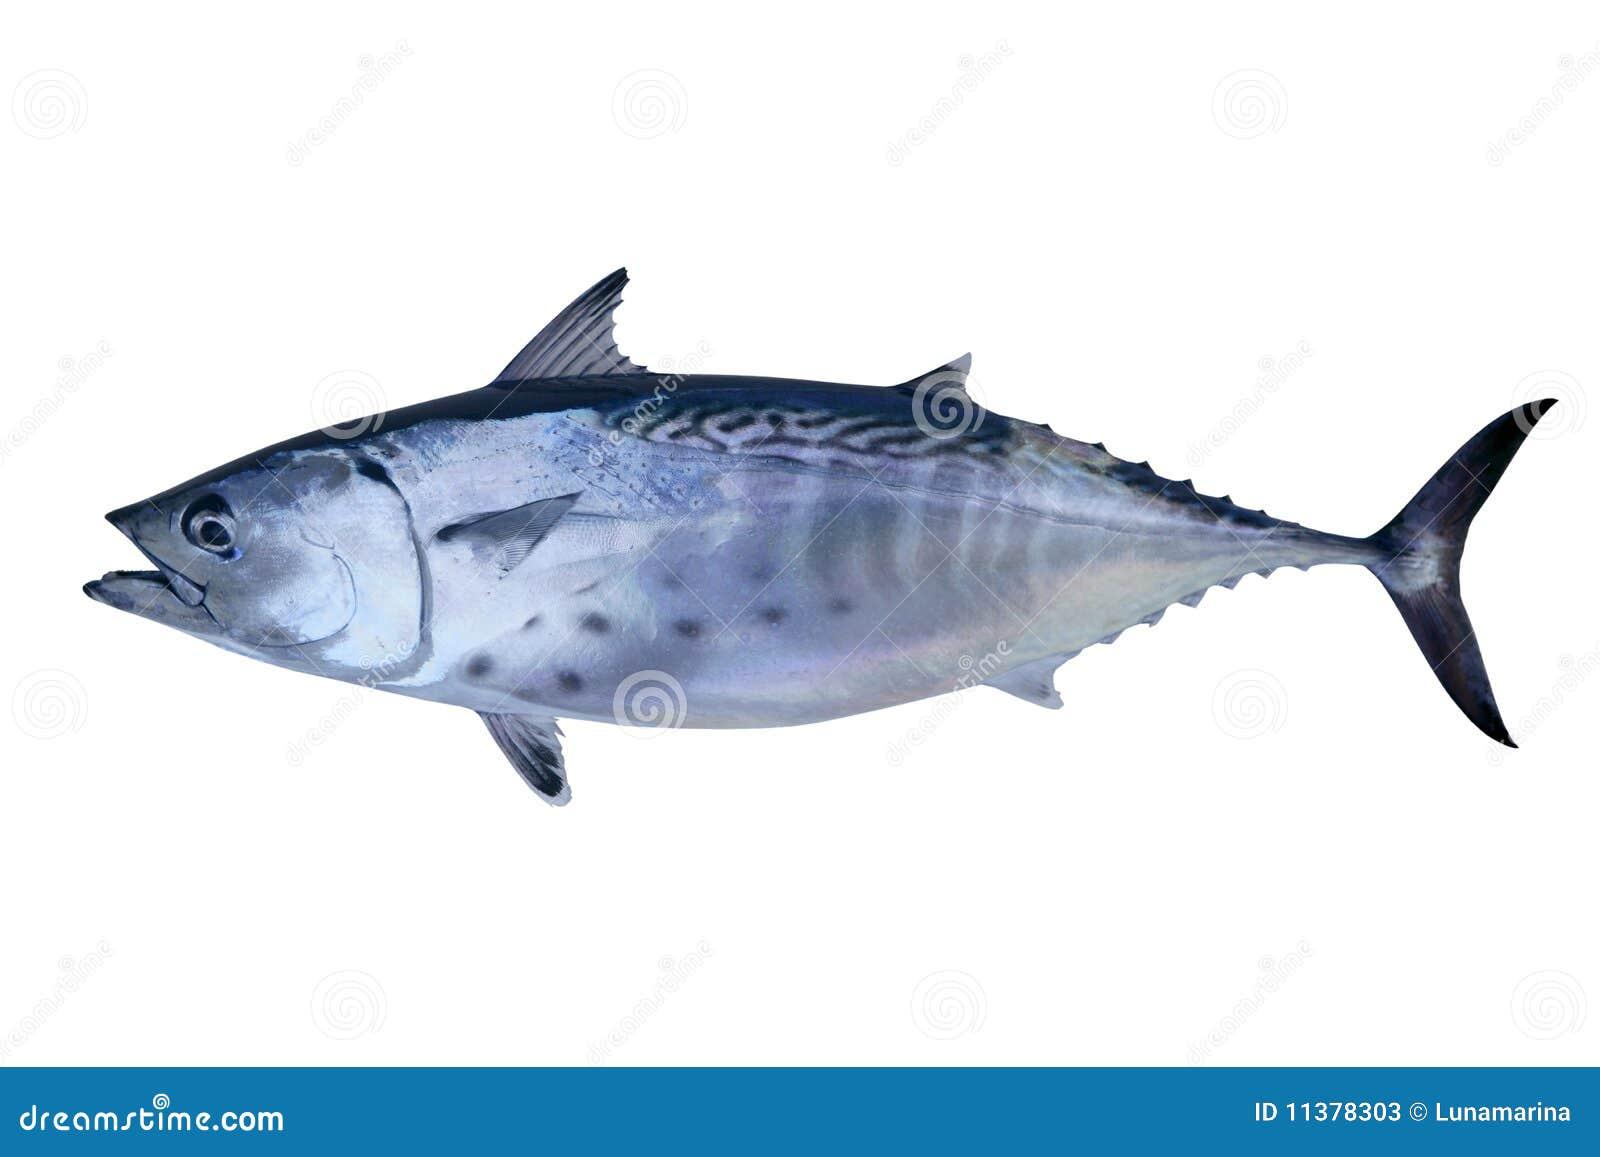 Little tunny catch tuna fish seafood stock image image for Tuna fish price